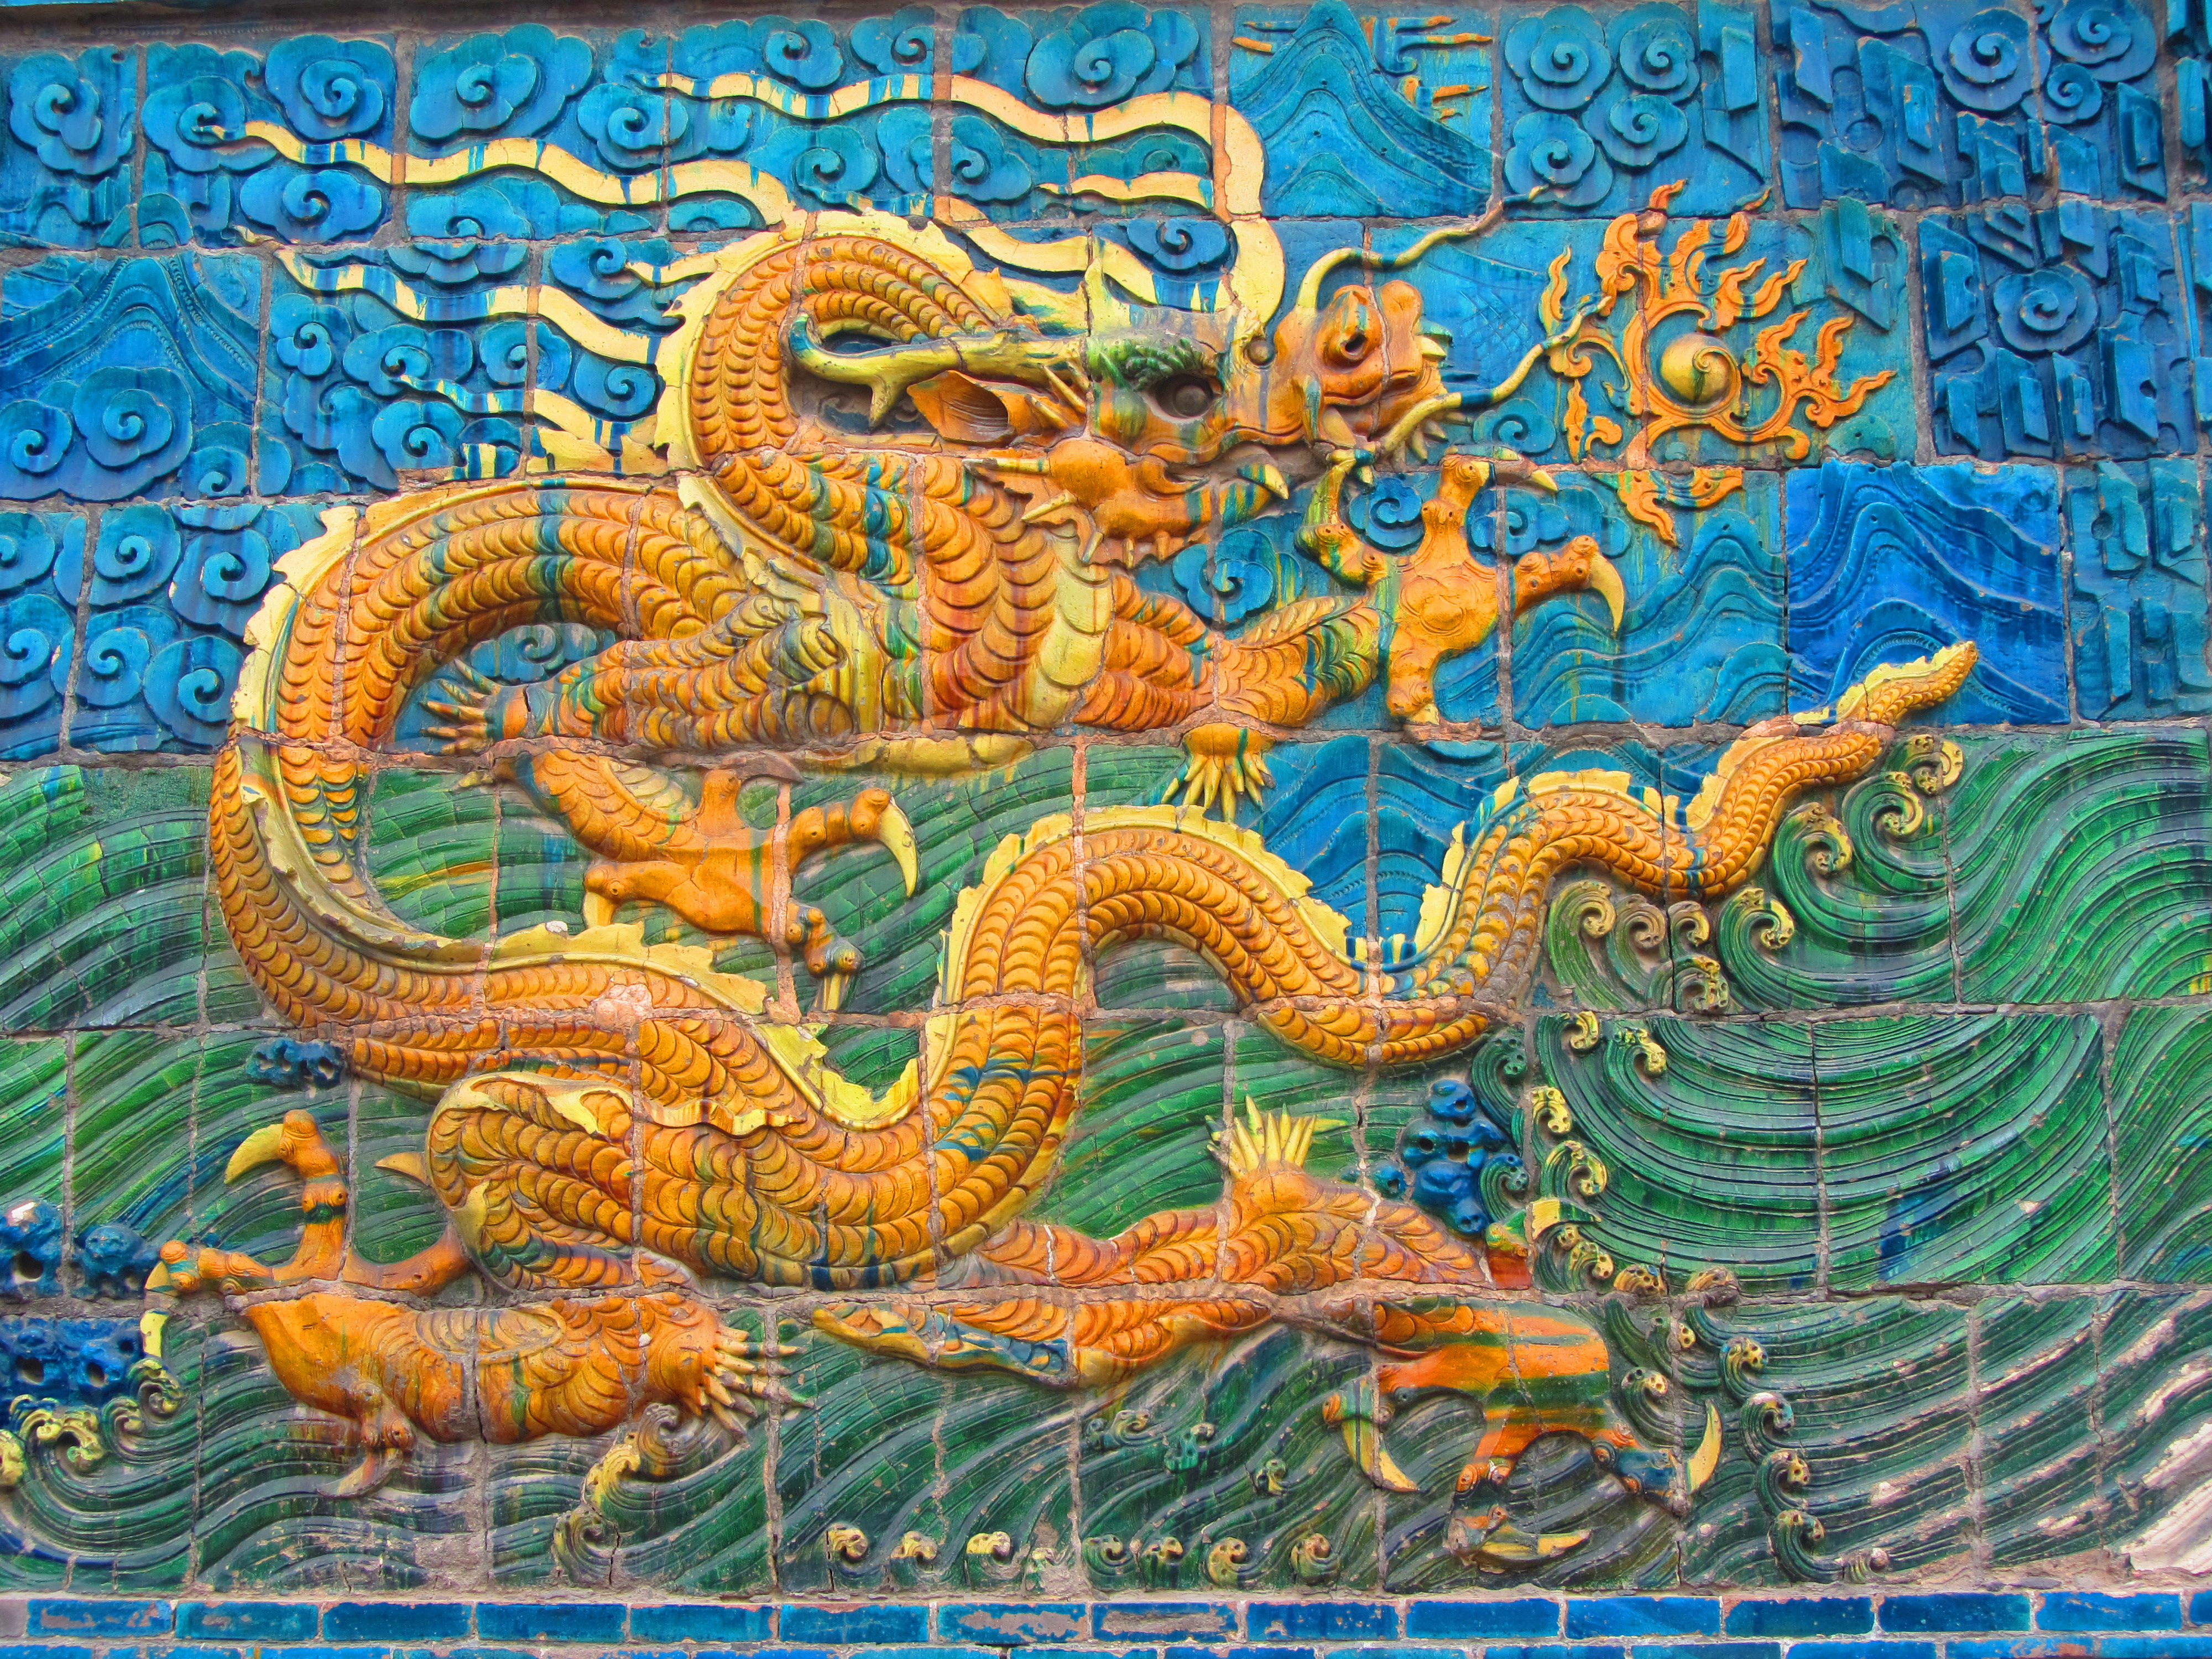 Nine Dragon Wall: File:The 3rd Dragon From The Left, Nine-Dragon Wall